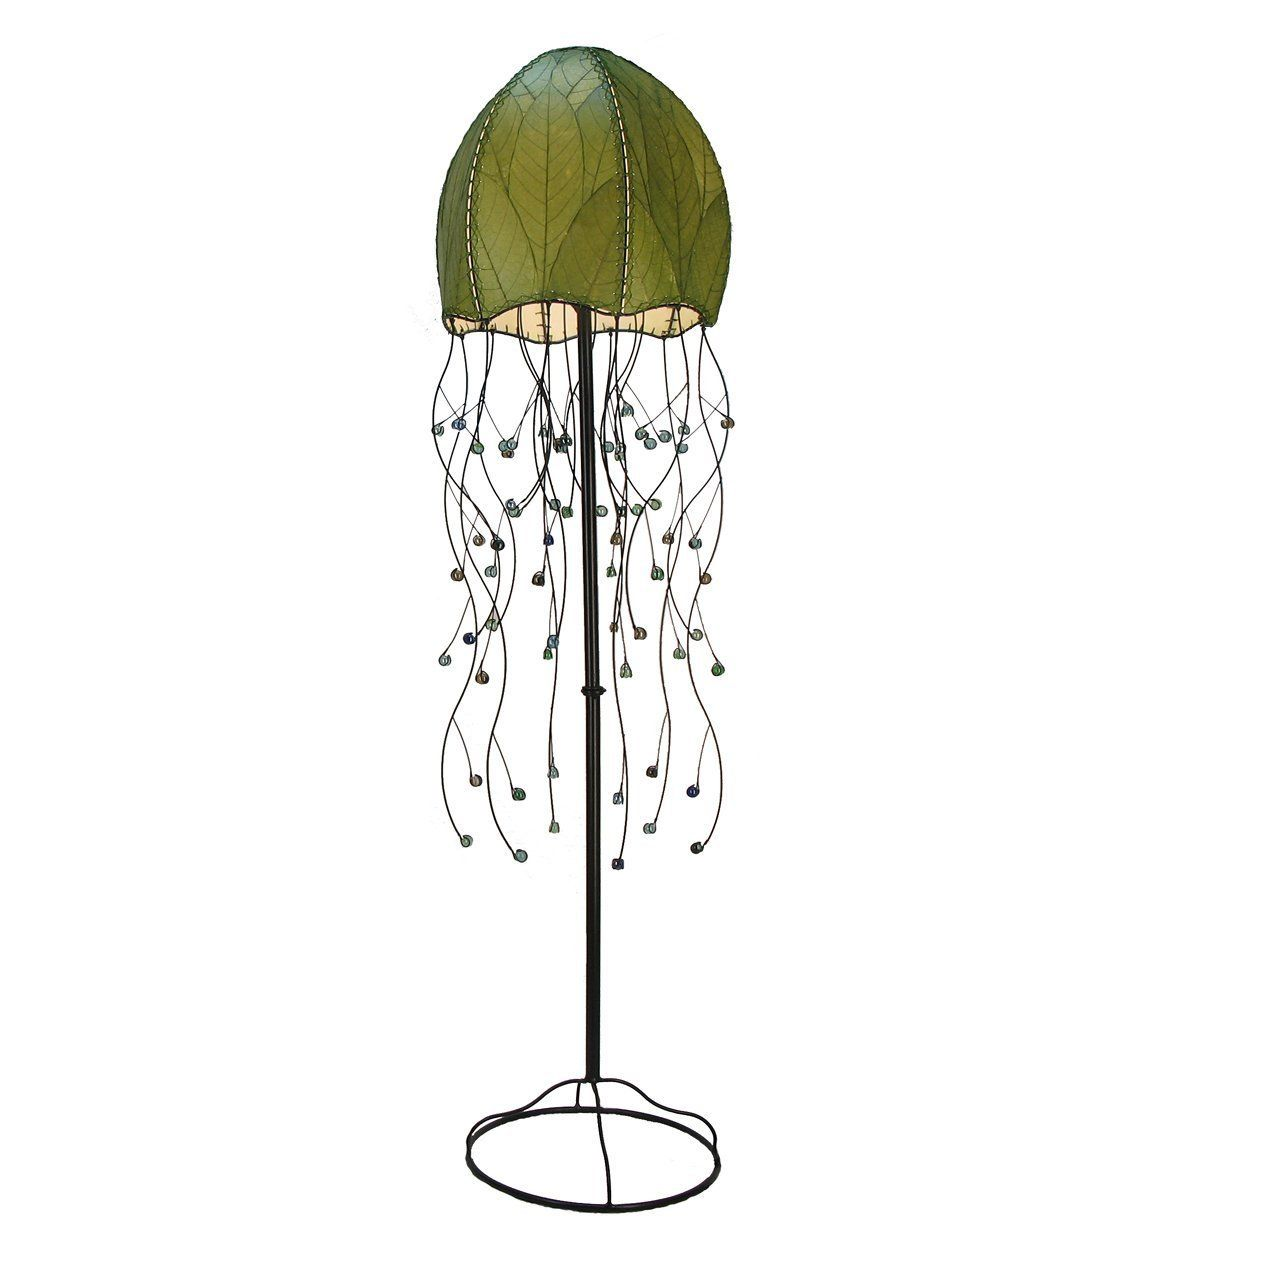 Eangee Home Designs 399 G 2 Light Jellyfish Floor Lamp - Amazon ...